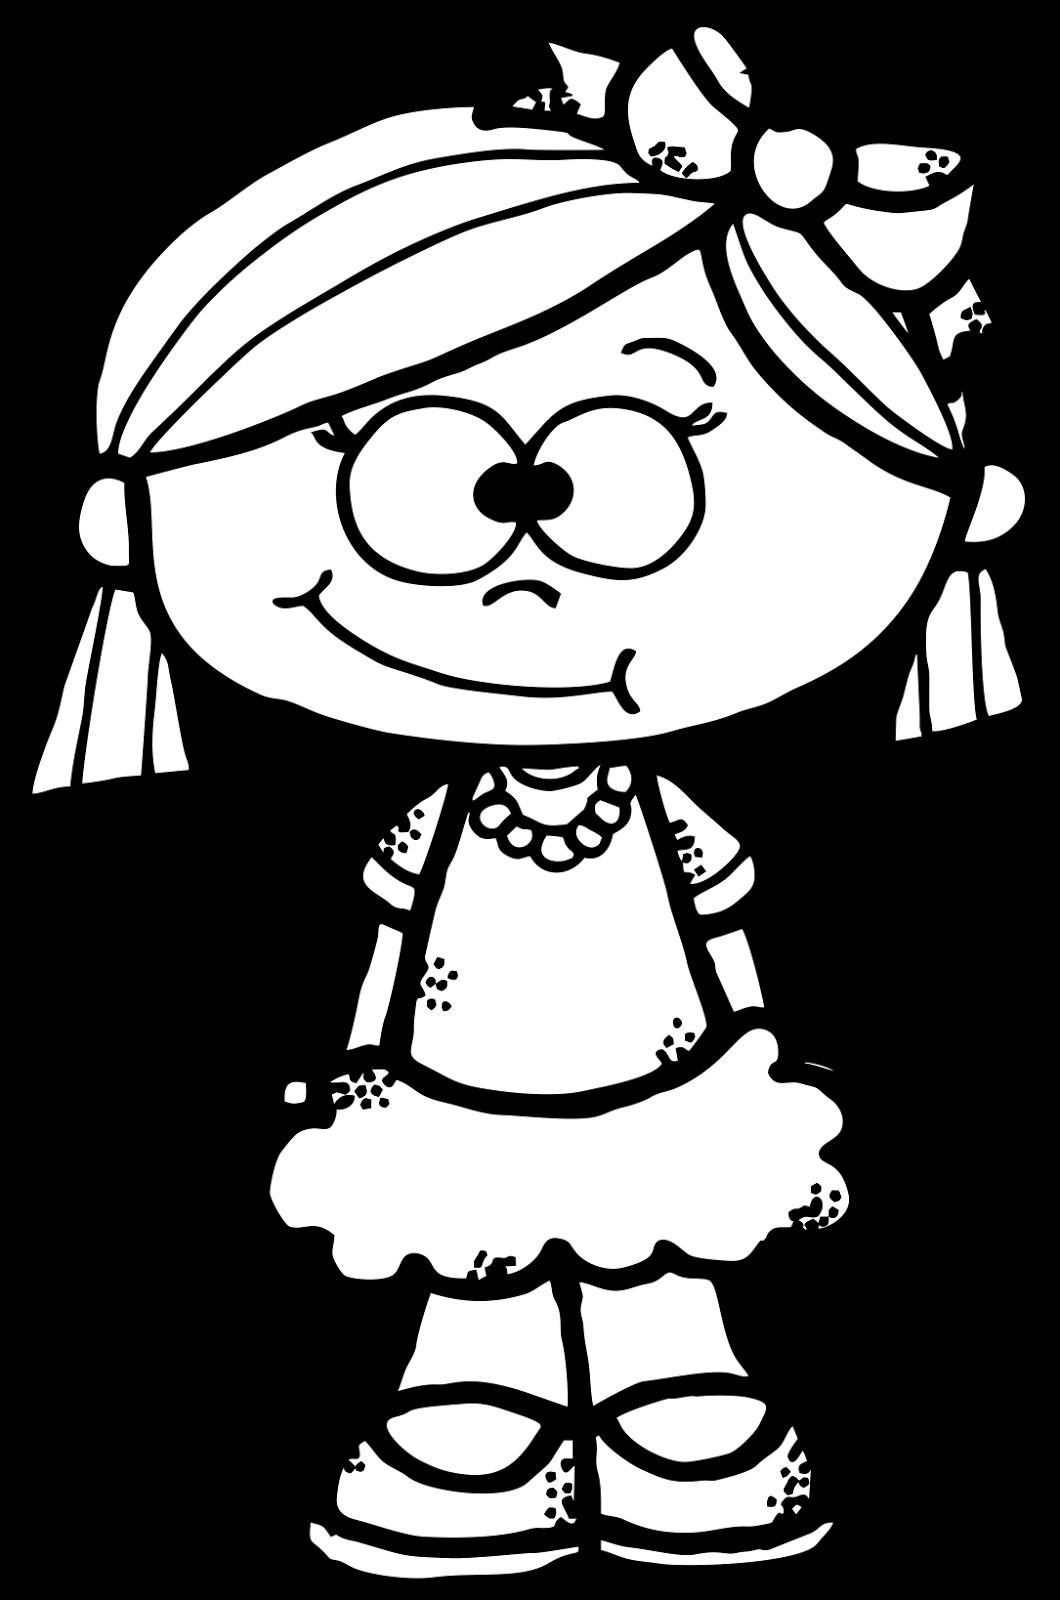 Clipart freebie png free library WorksheetJunkie: Cute girl Clipart Freebie   Digital images   Girl ... png free library